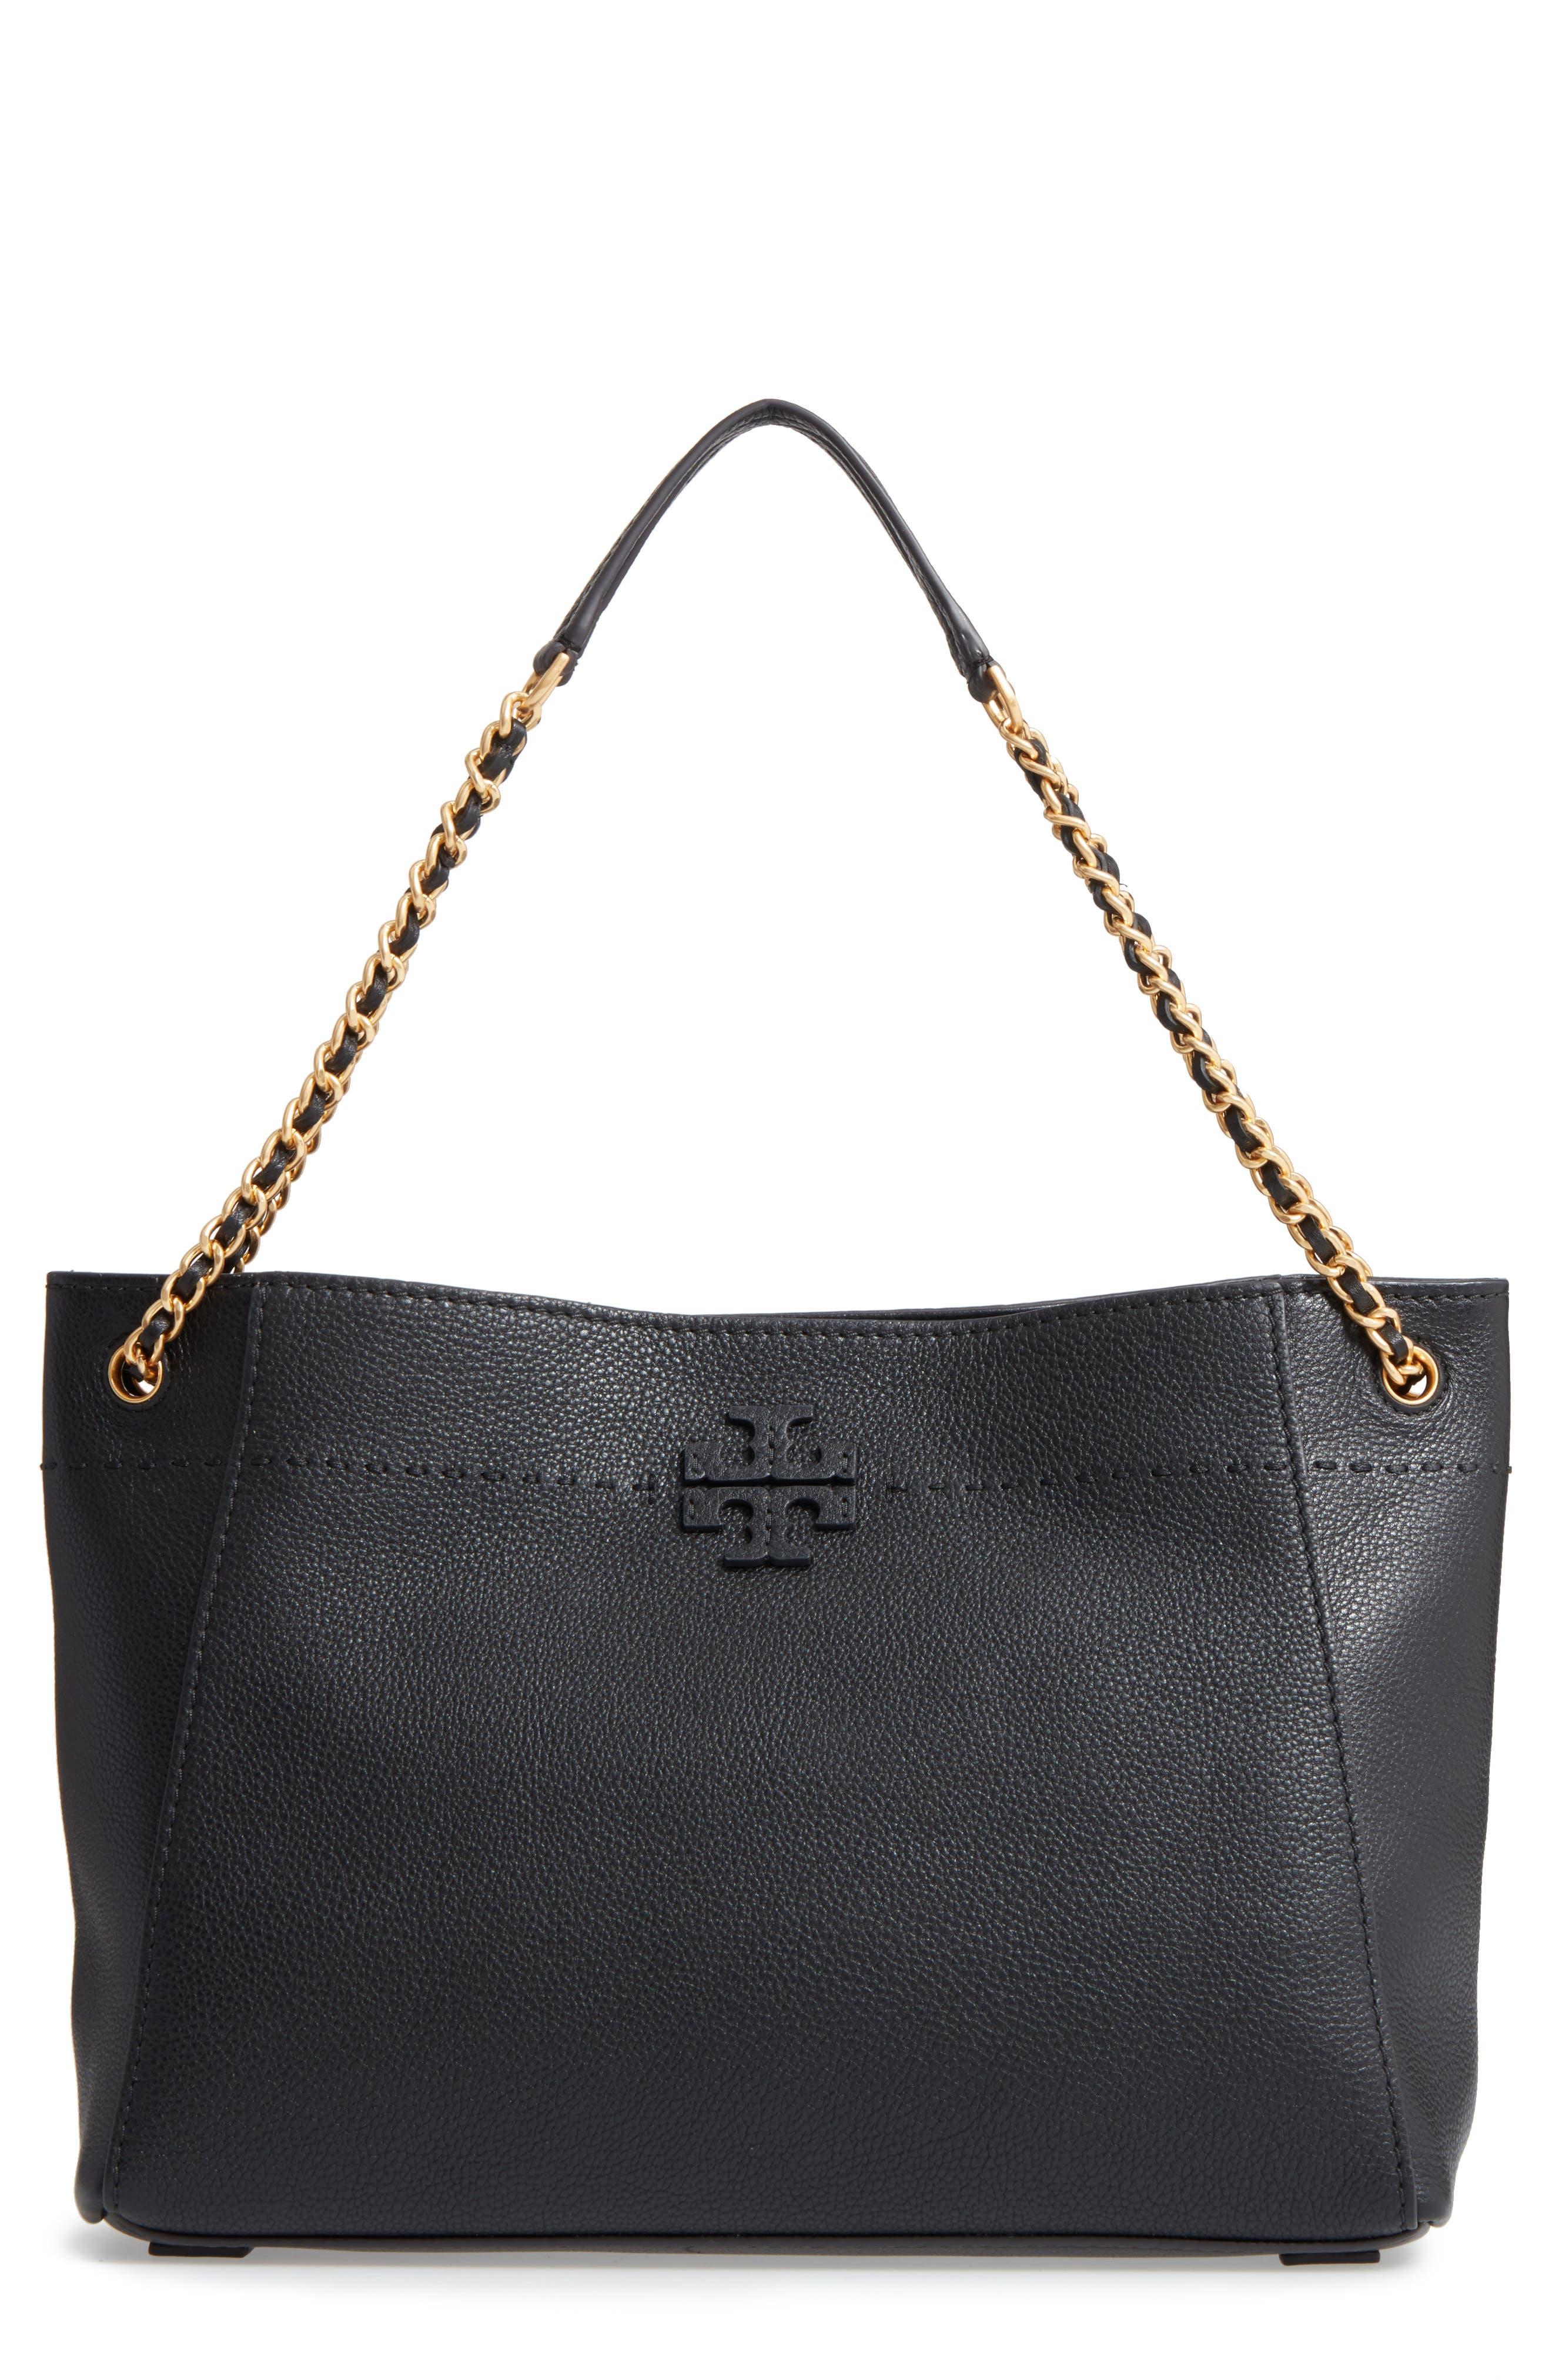 McGraw Slouchy Leather Shoulder Bag,                             Main thumbnail 1, color,                             Black